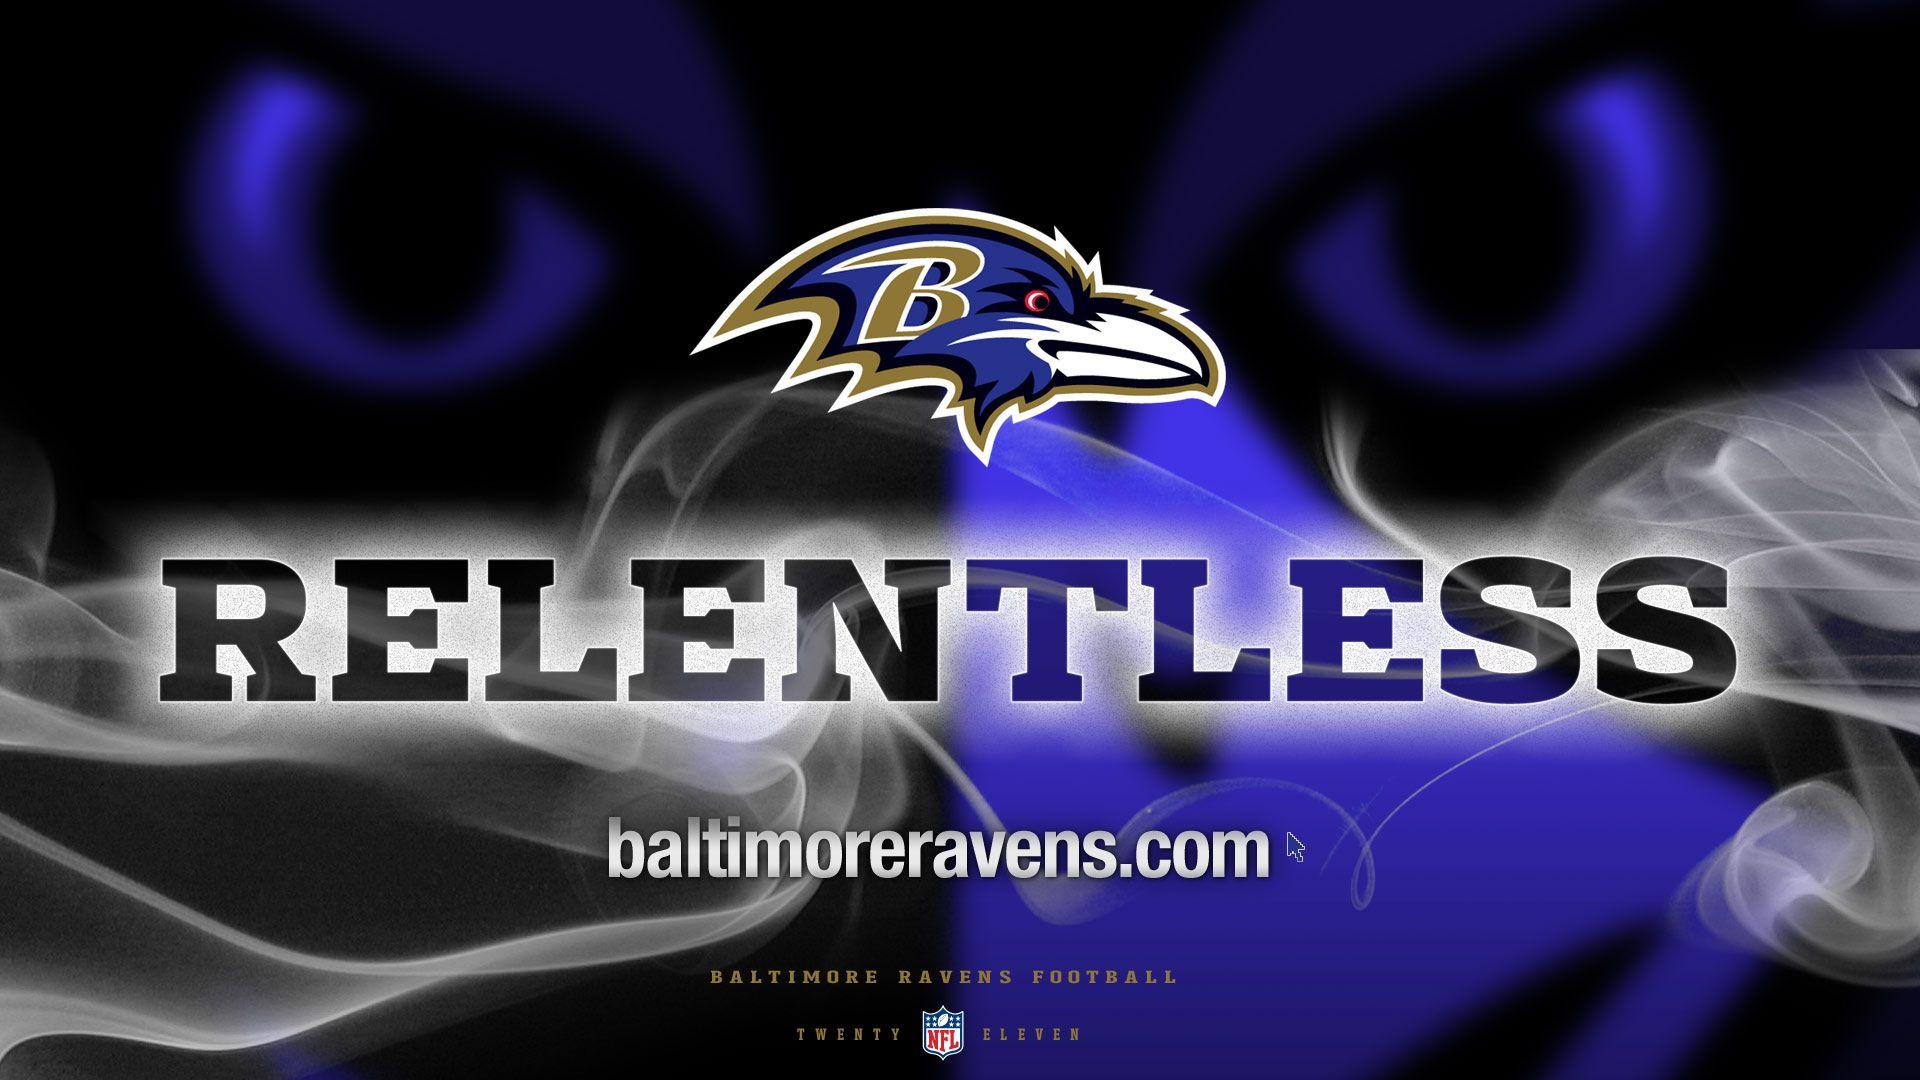 Baltimore Ravens Wallpaper Screensavers 1920 1200 Ravens Wallpaper 43 Wallpapers A Baltimore Ravens Wallpapers Baltimore Ravens Logo Nfl Baltimore Ravens